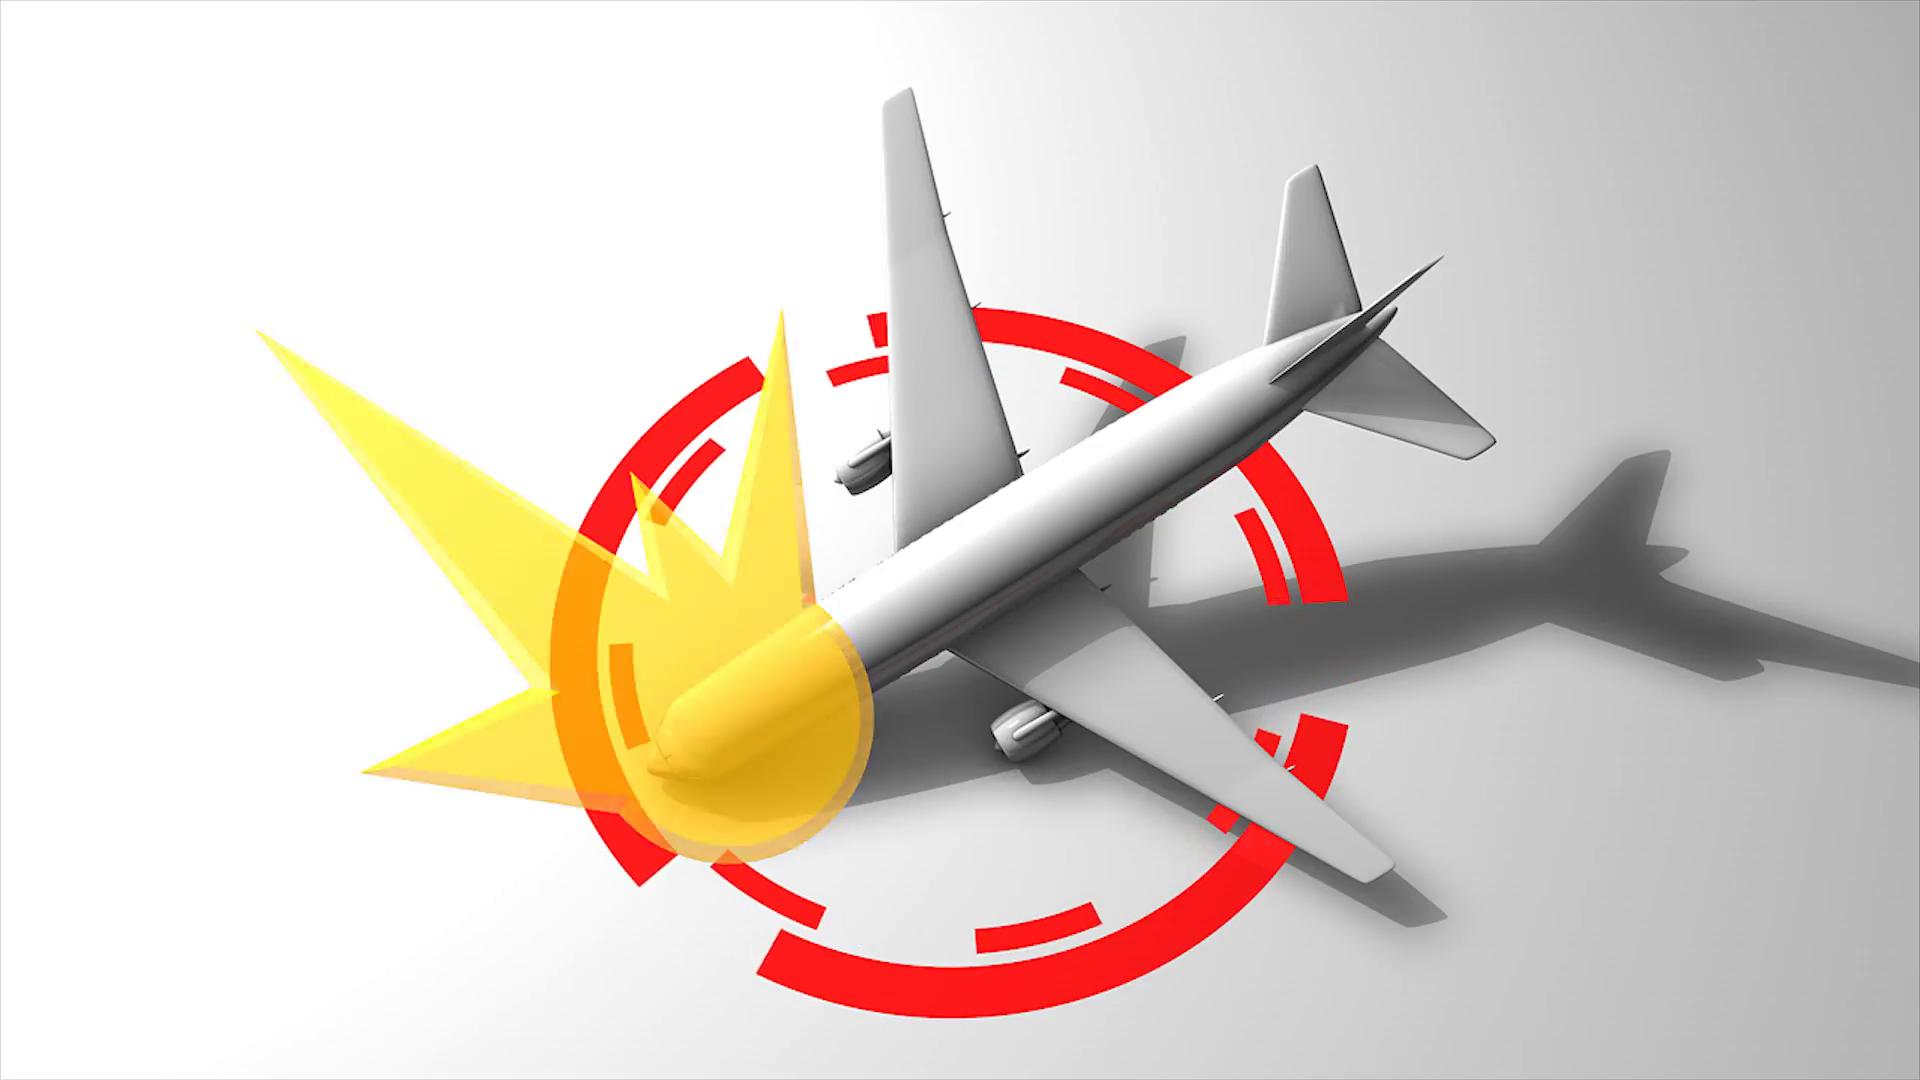 Plane crash graphic animation. matte included.